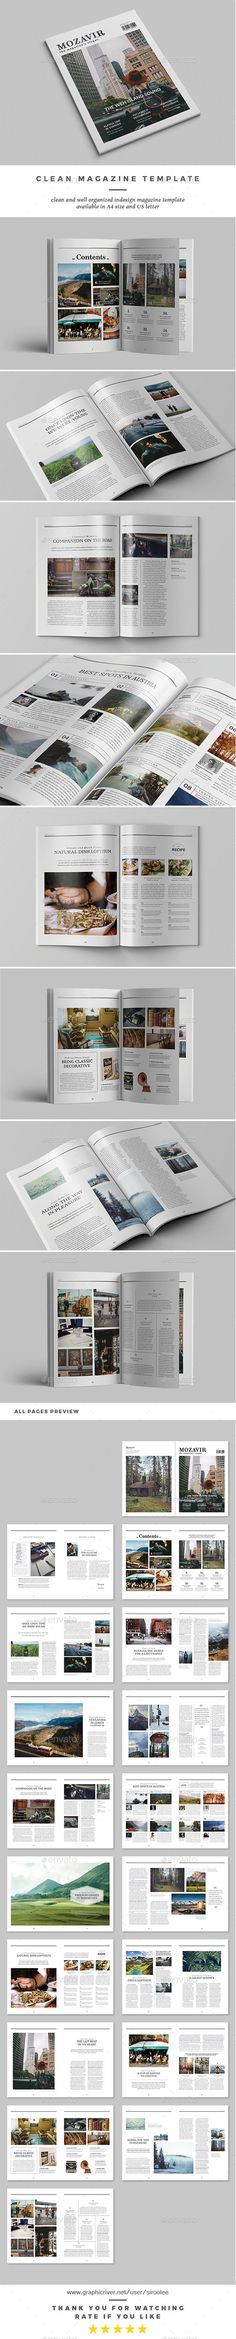 Mozavir Magazine - Magazines Print Templates Download here : https://graphicriver.net/item/mozavir-magazine/20683620?s_rank=2&ref=Al-fatih #magazine #magazine template #magazine layout #template #premium design #design grafis #layout #creative design #indesign magazine